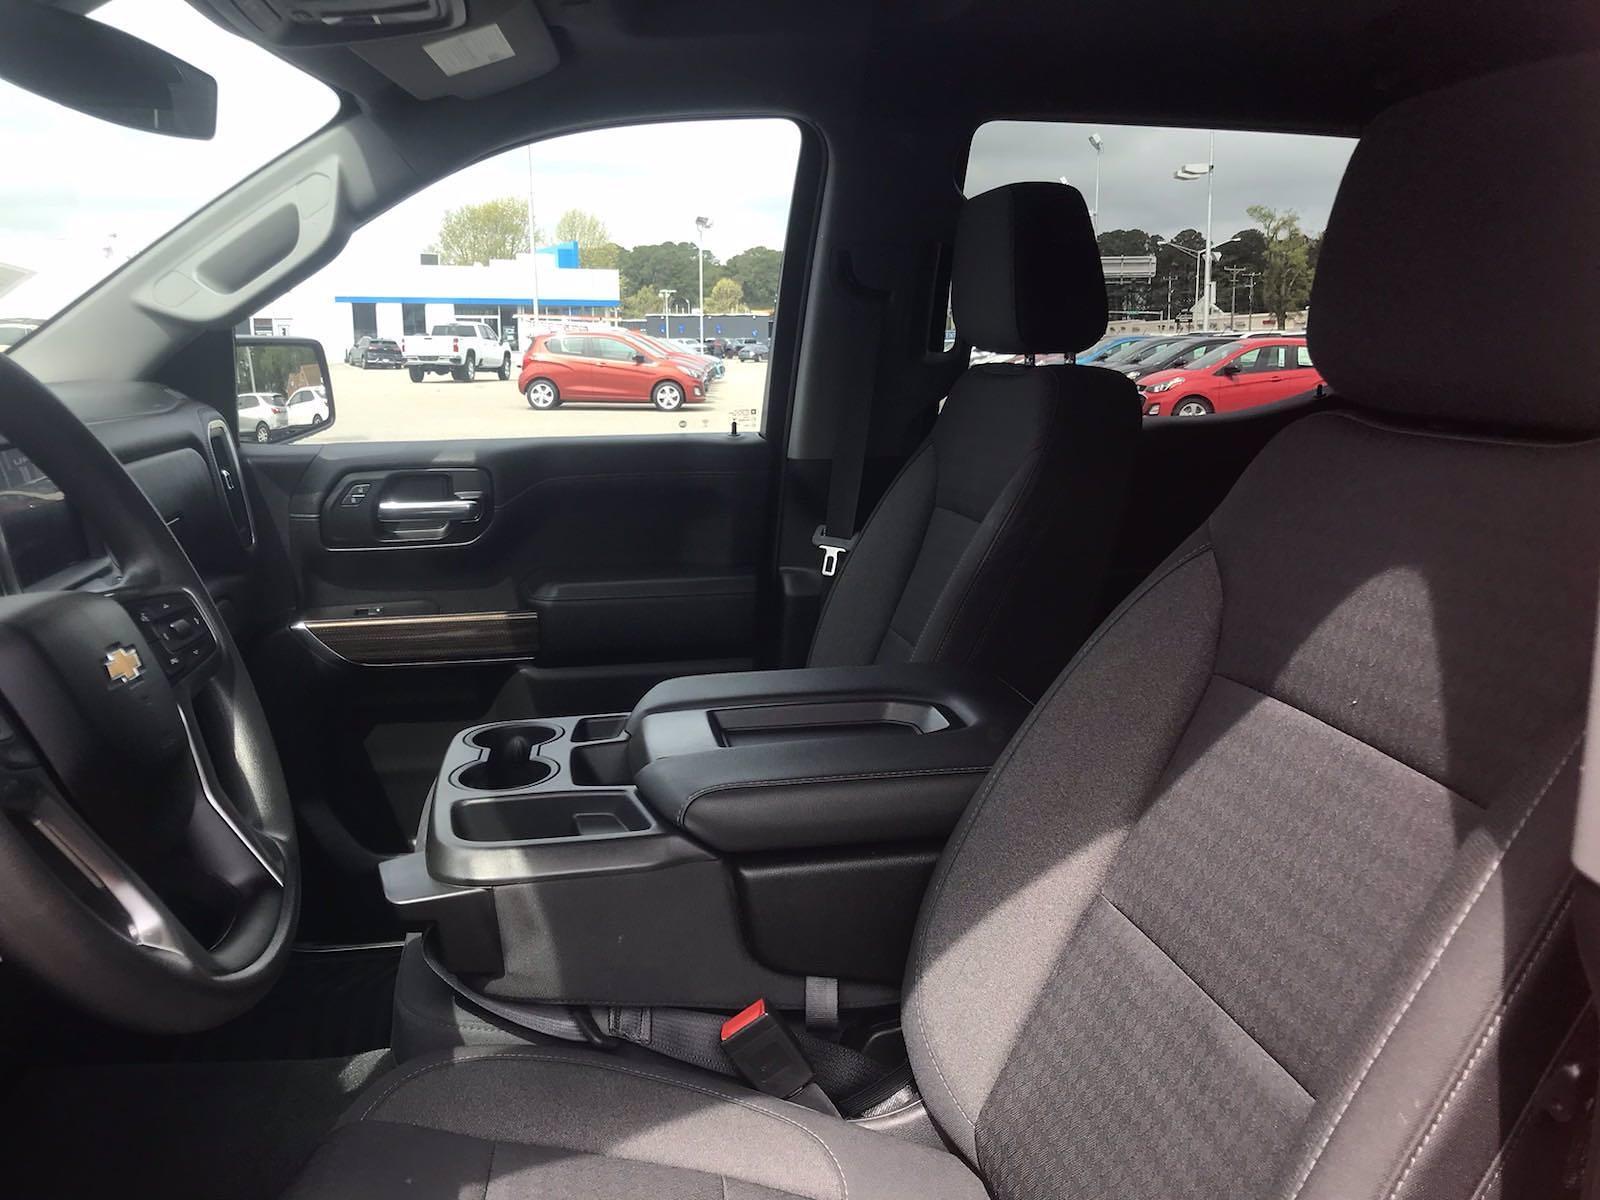 2020 Chevrolet Silverado 1500 Crew Cab 4x4, Pickup #16466PN - photo 24